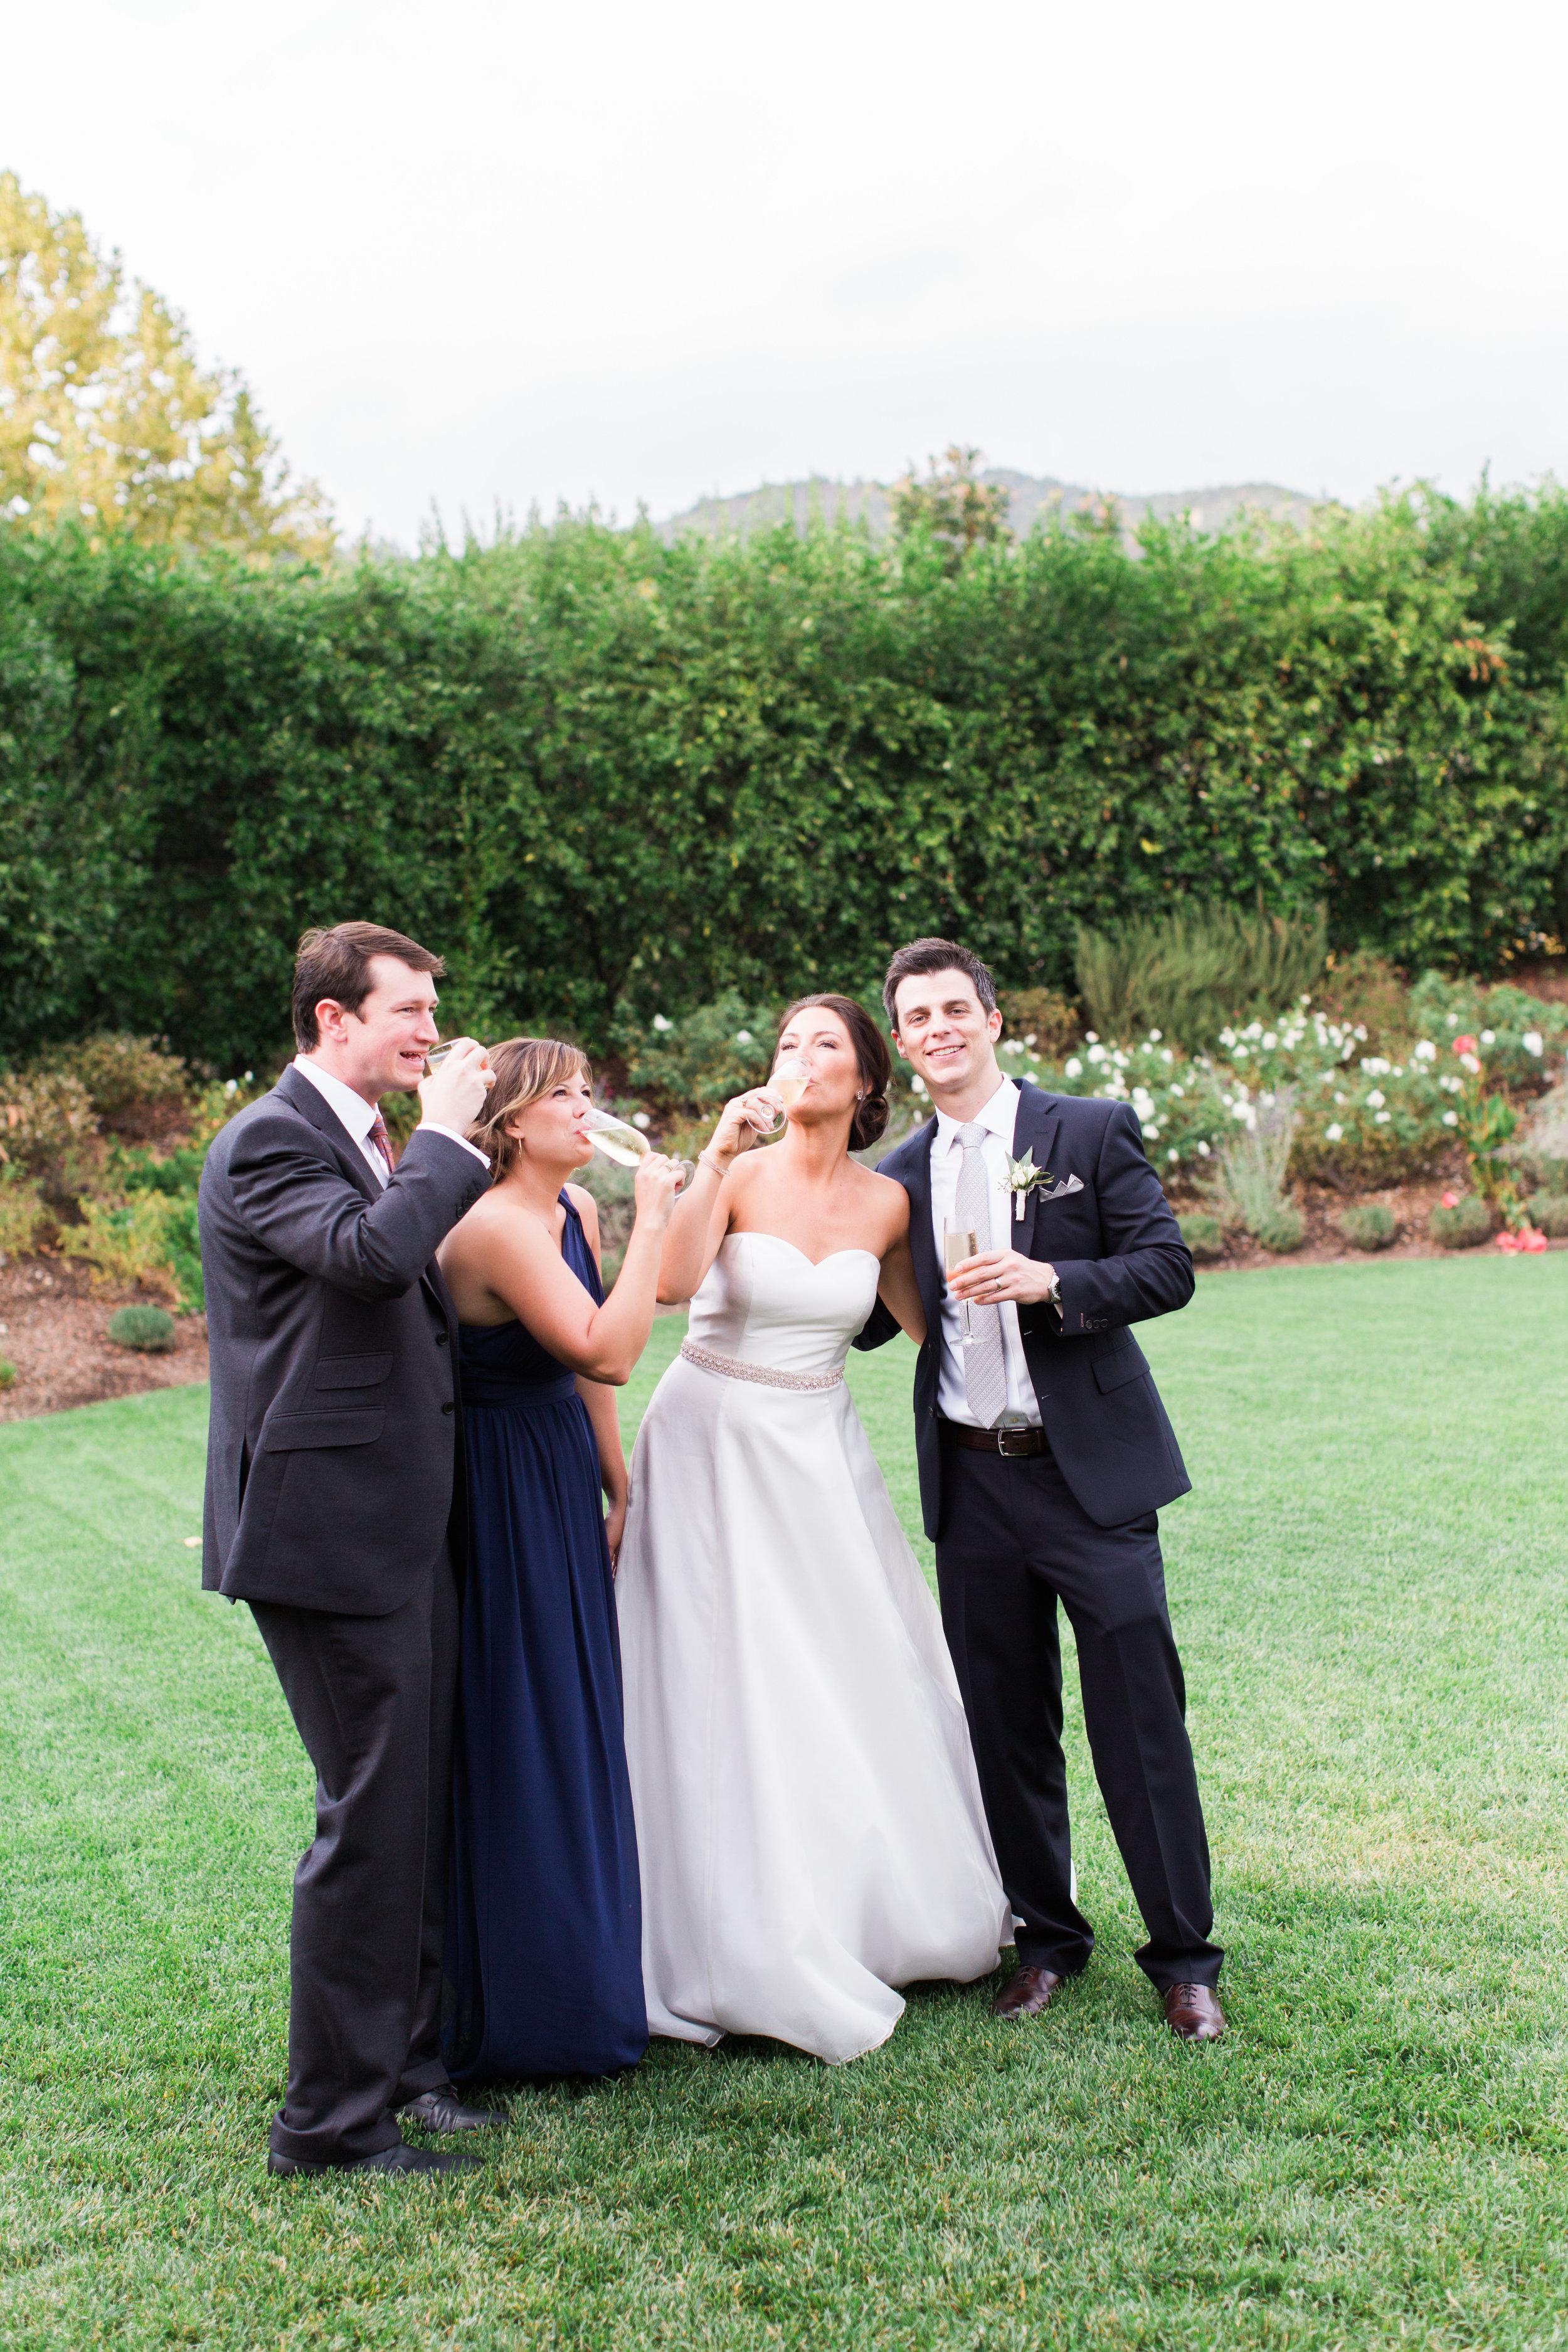 intimate-wedding-at-solage-calistoga-in-napa-81.jpg